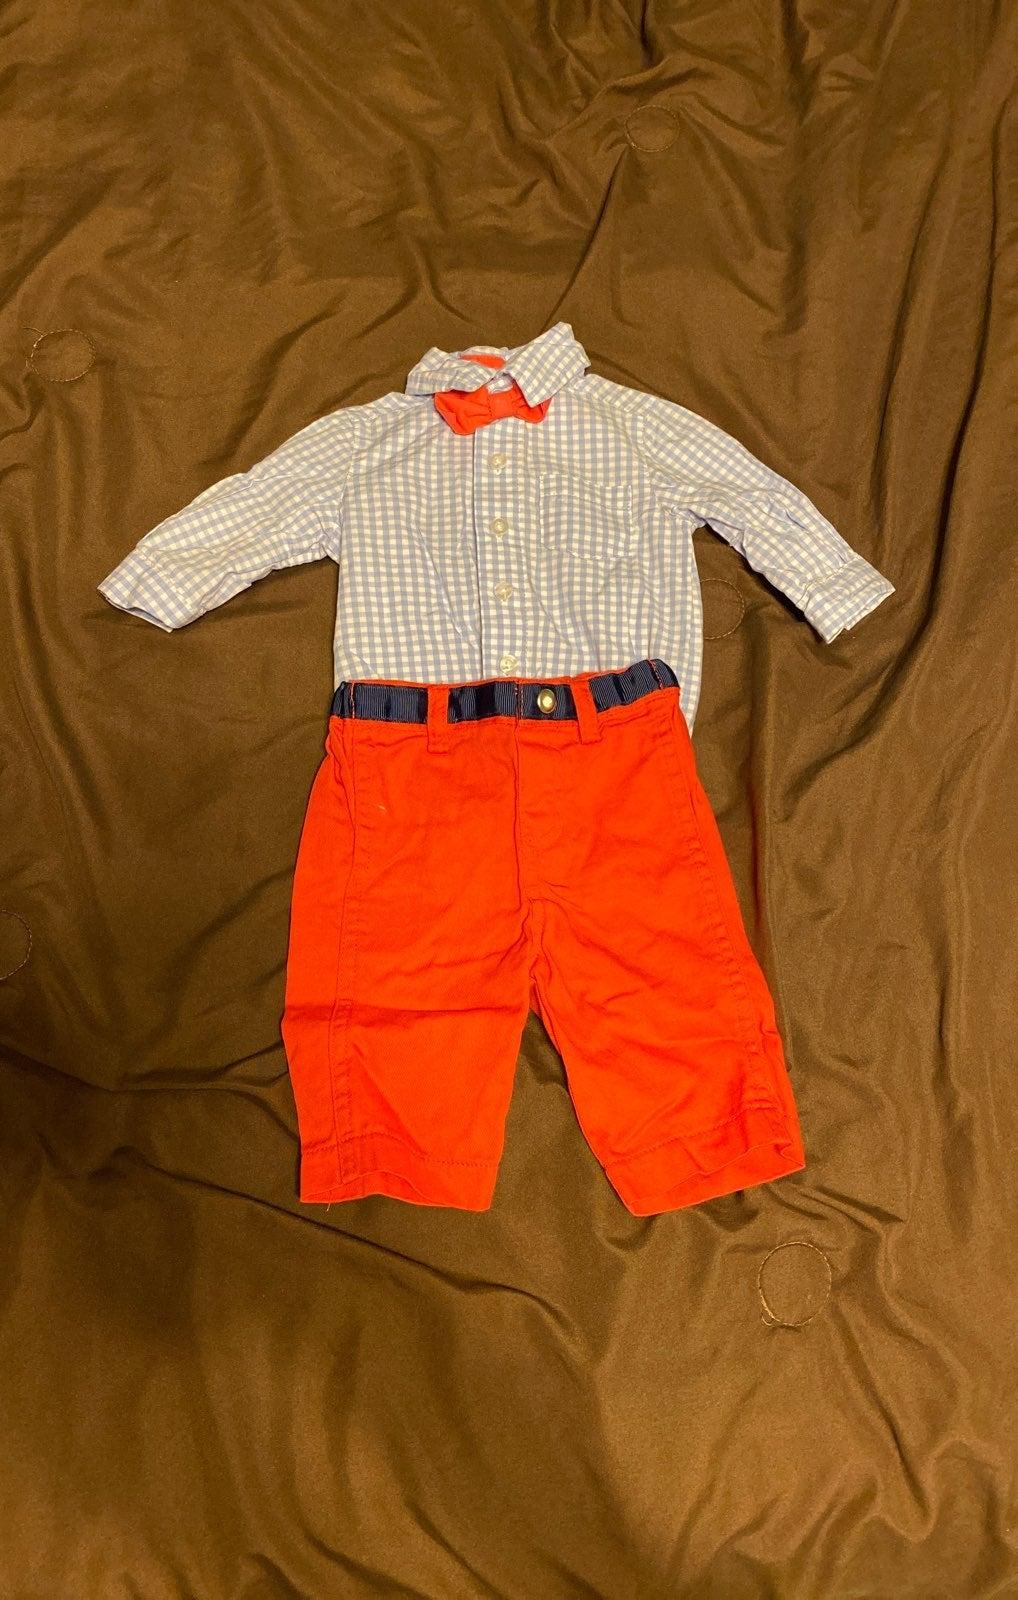 Baby boy newborn outfit